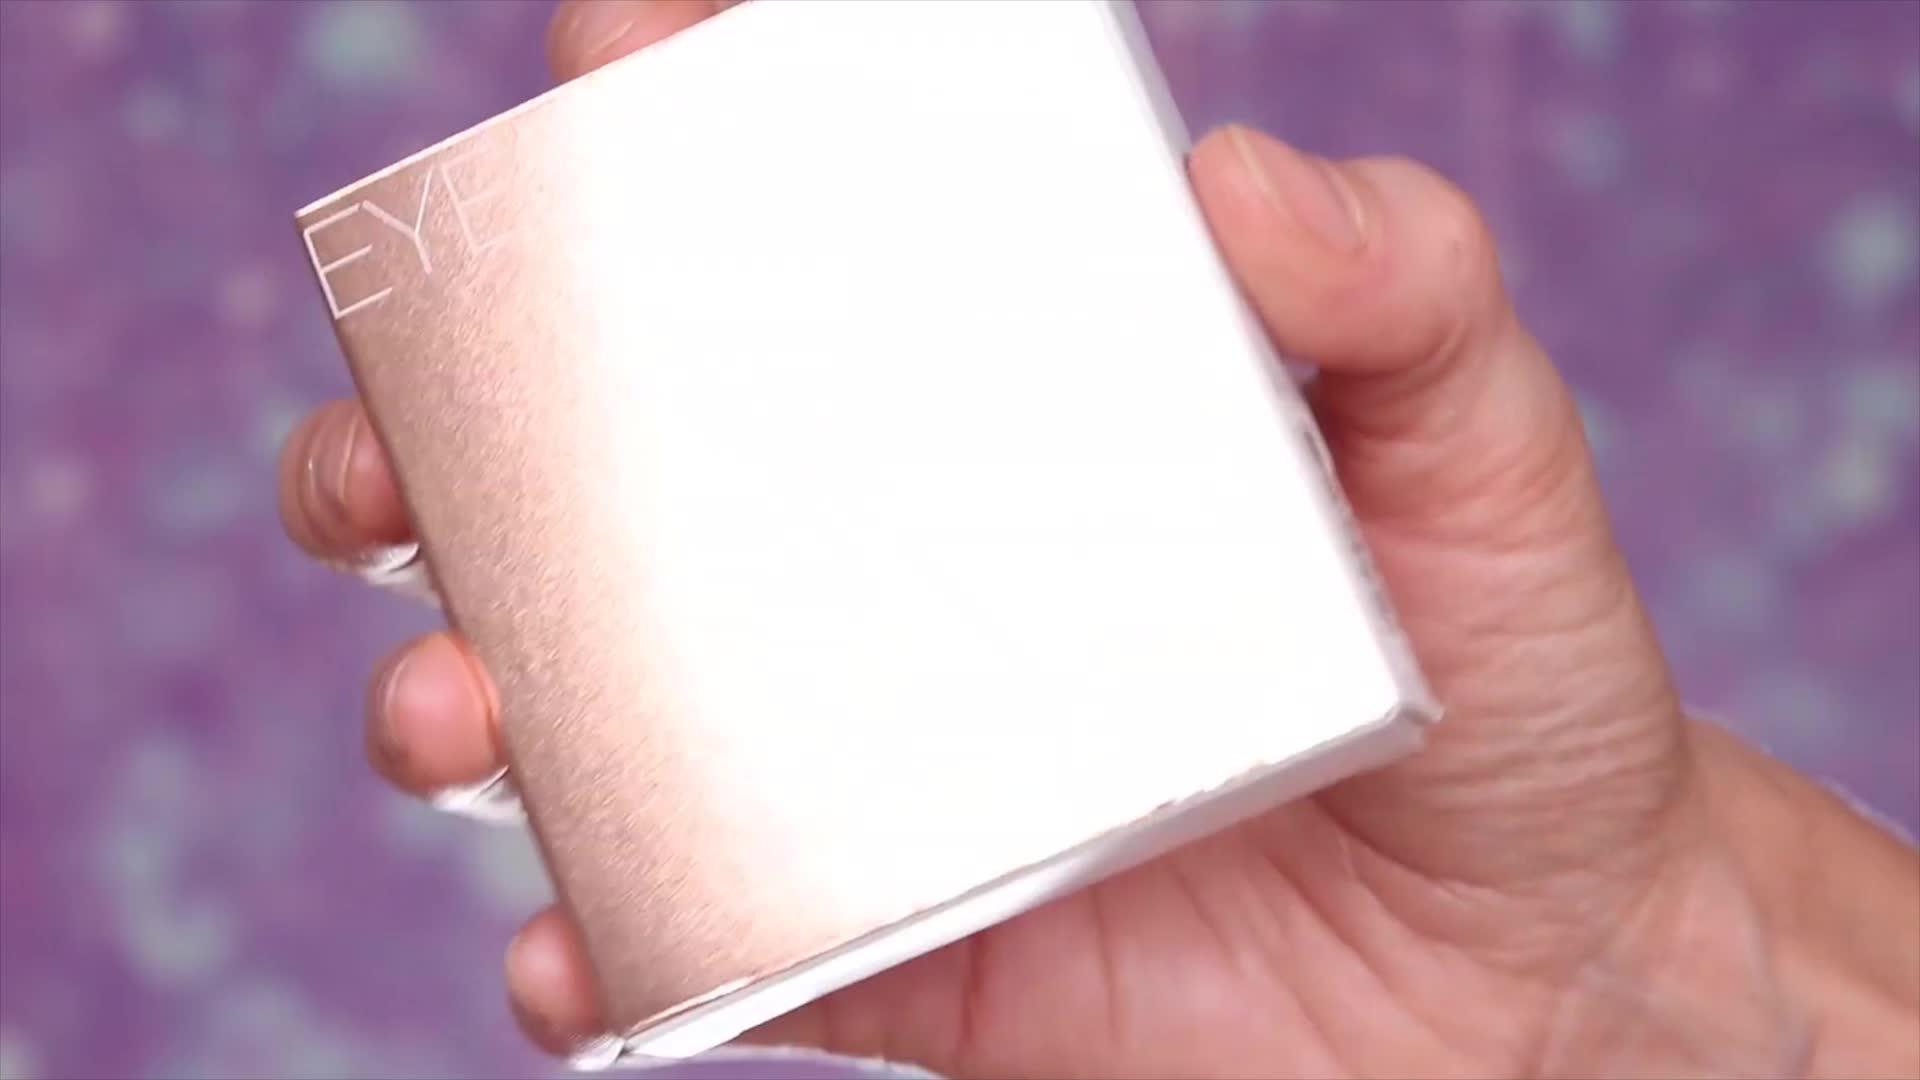 O. Tw O.o Groothandel Reizen Pak Make-Up Sets Oogschaduw 4 Kleuren Oogschaduw Palet